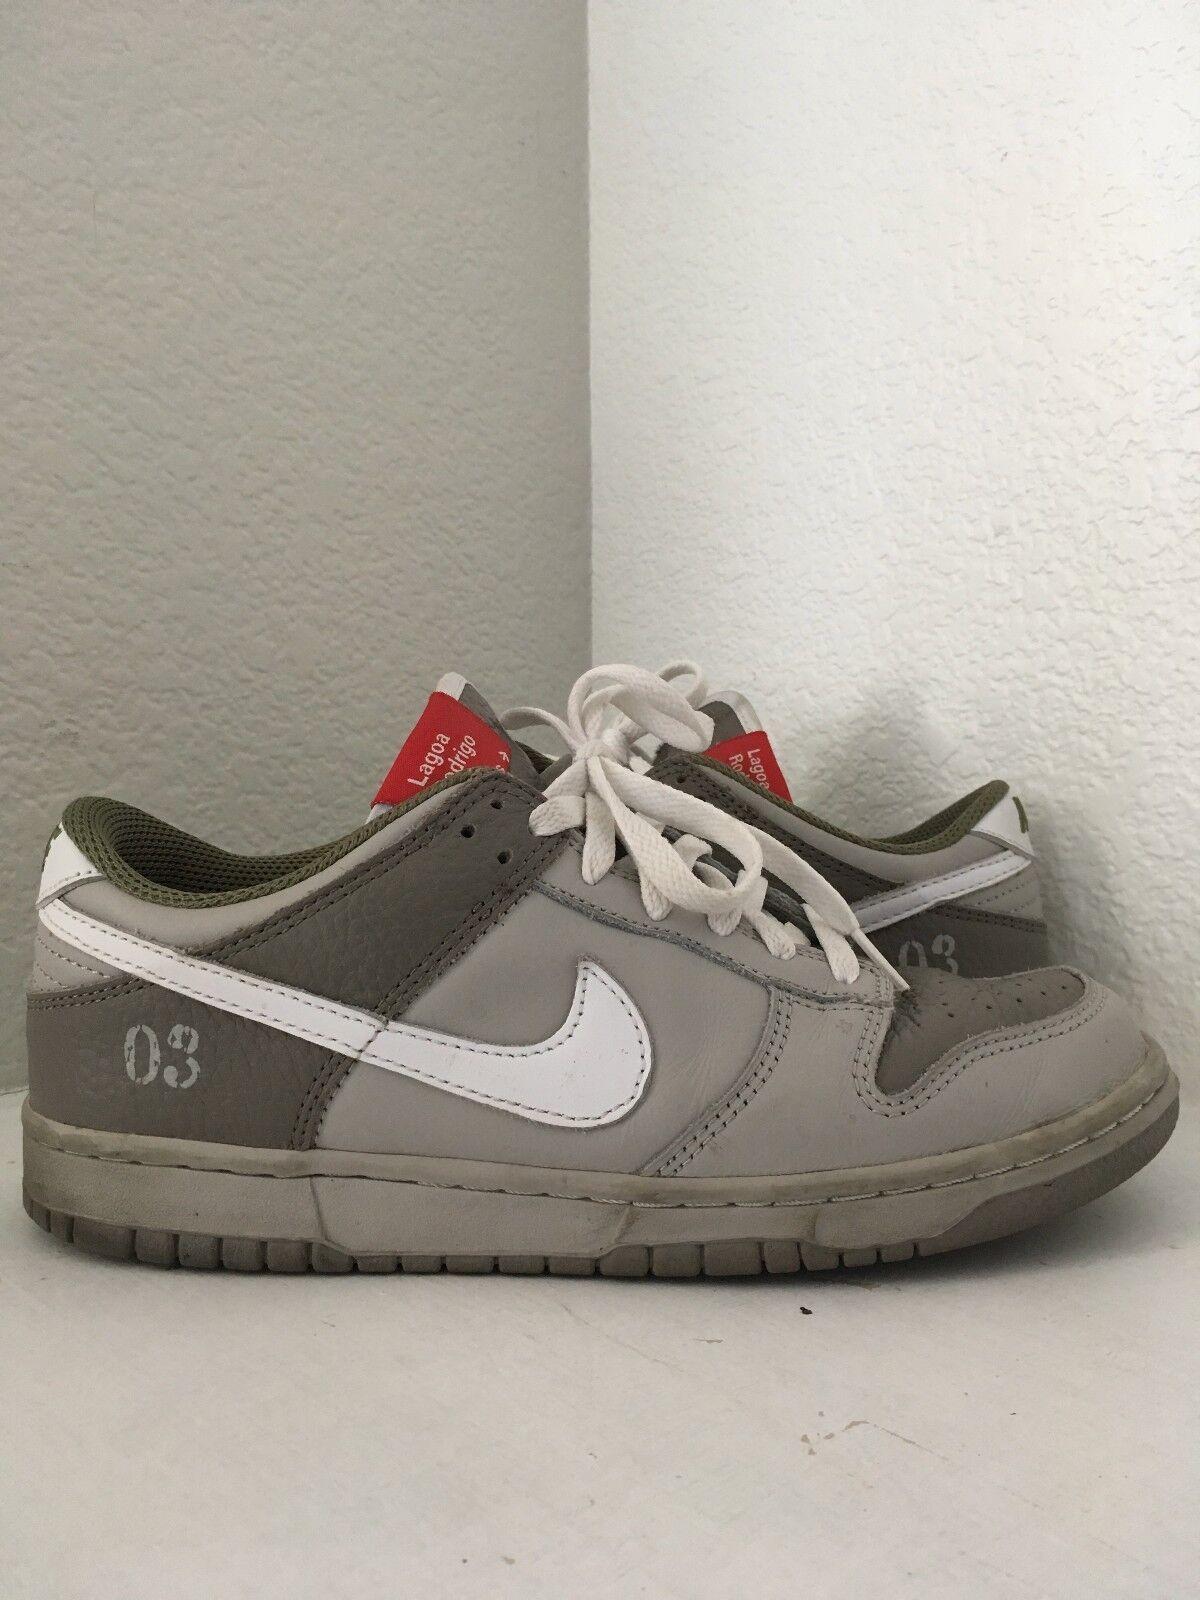 2018 Lagoa Nike Dunk Low Premium Lagoa 2018 Rodrigo de Freitas gris - blanco cómodo 48ca0f